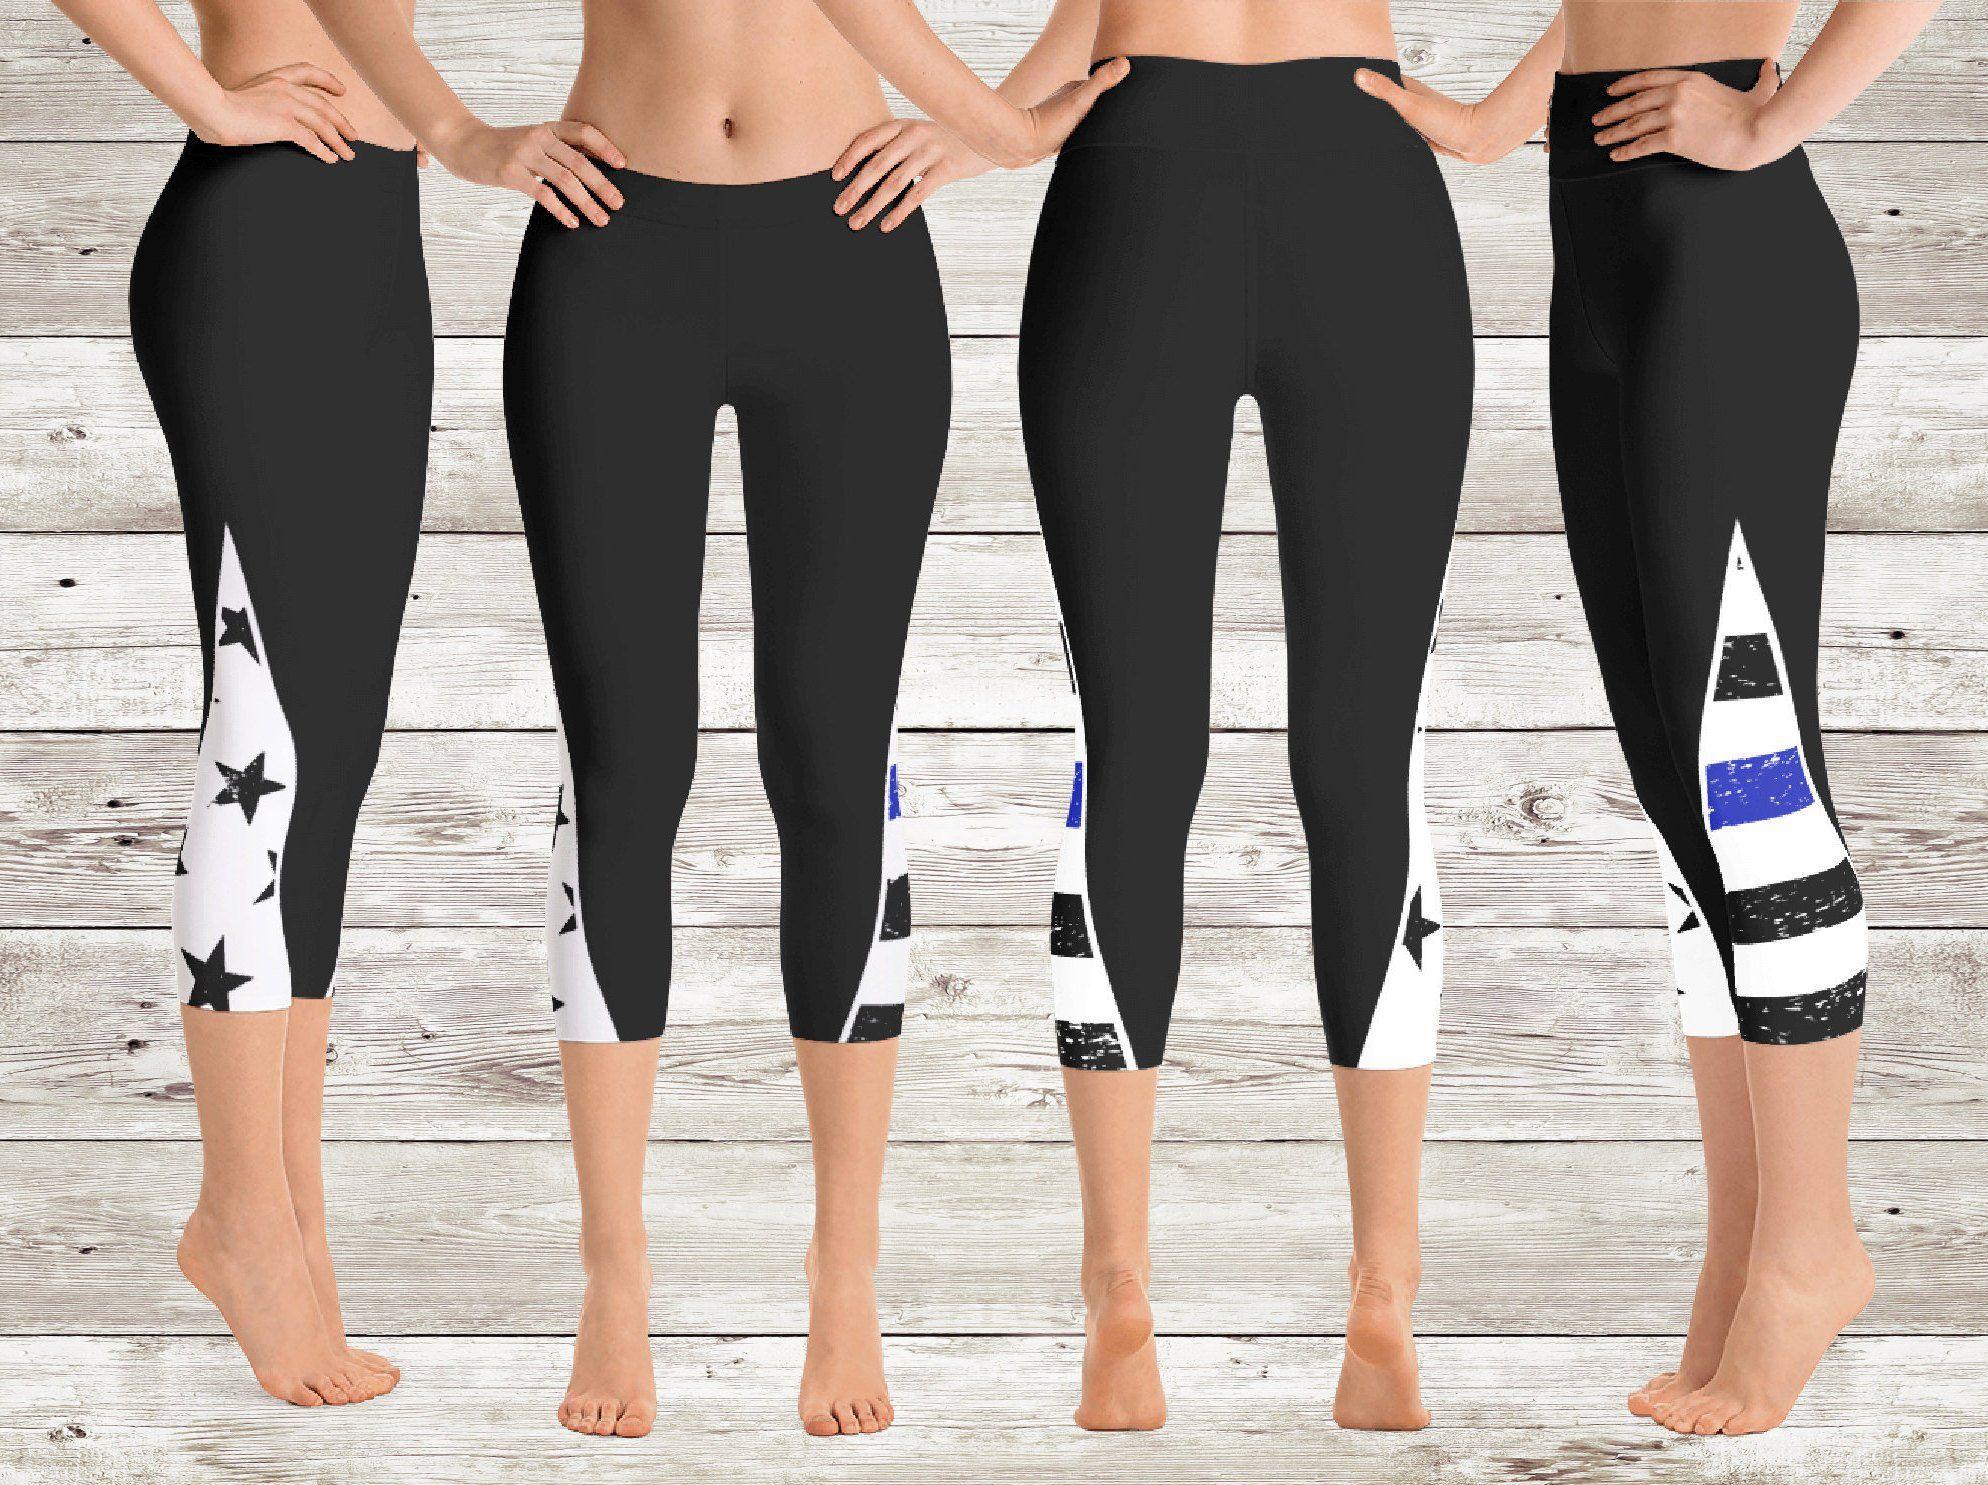 Thin Blue Line Capri Leggings - Back the Blue Leggings - Blue Lives Matter Yoga  Pants - Thin Blue Line Workout Gear - Thin Blue Line Apparel 4cdb67c92